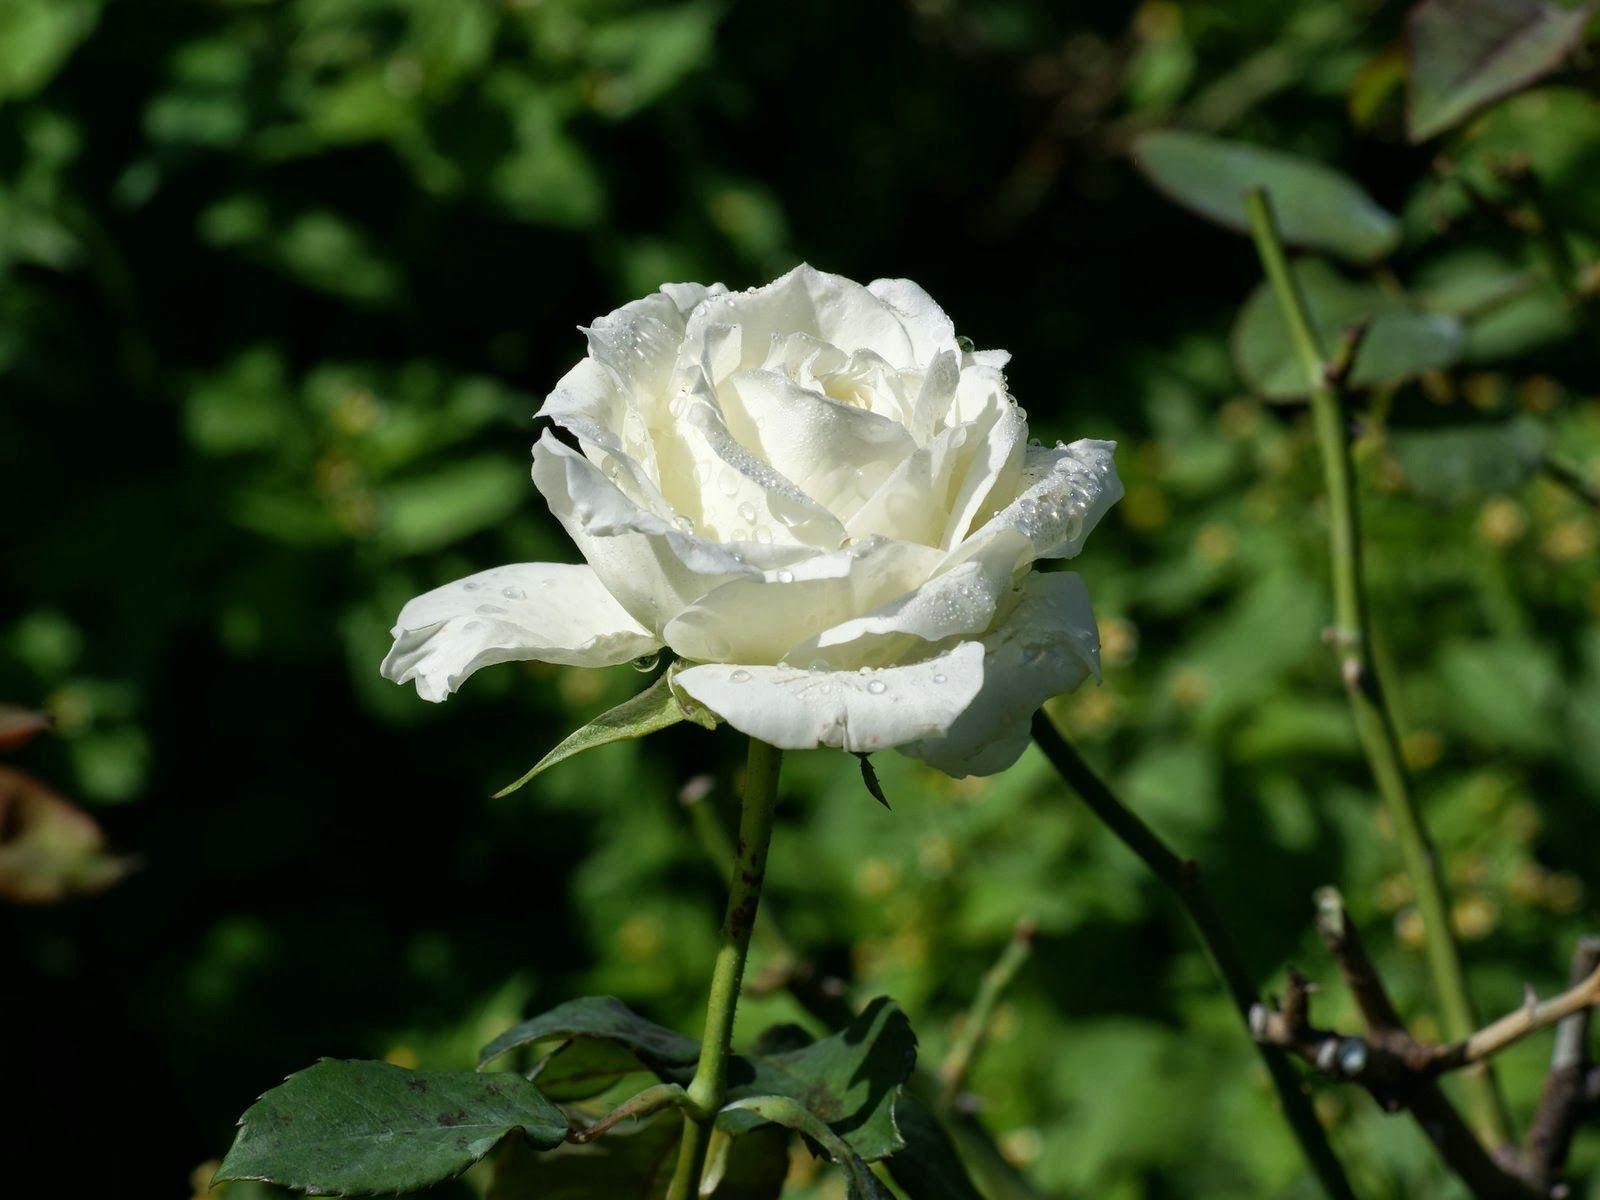 Mawar Putih Gambar Setangkai Bunga Mawar Putih Kumpulan Gambar